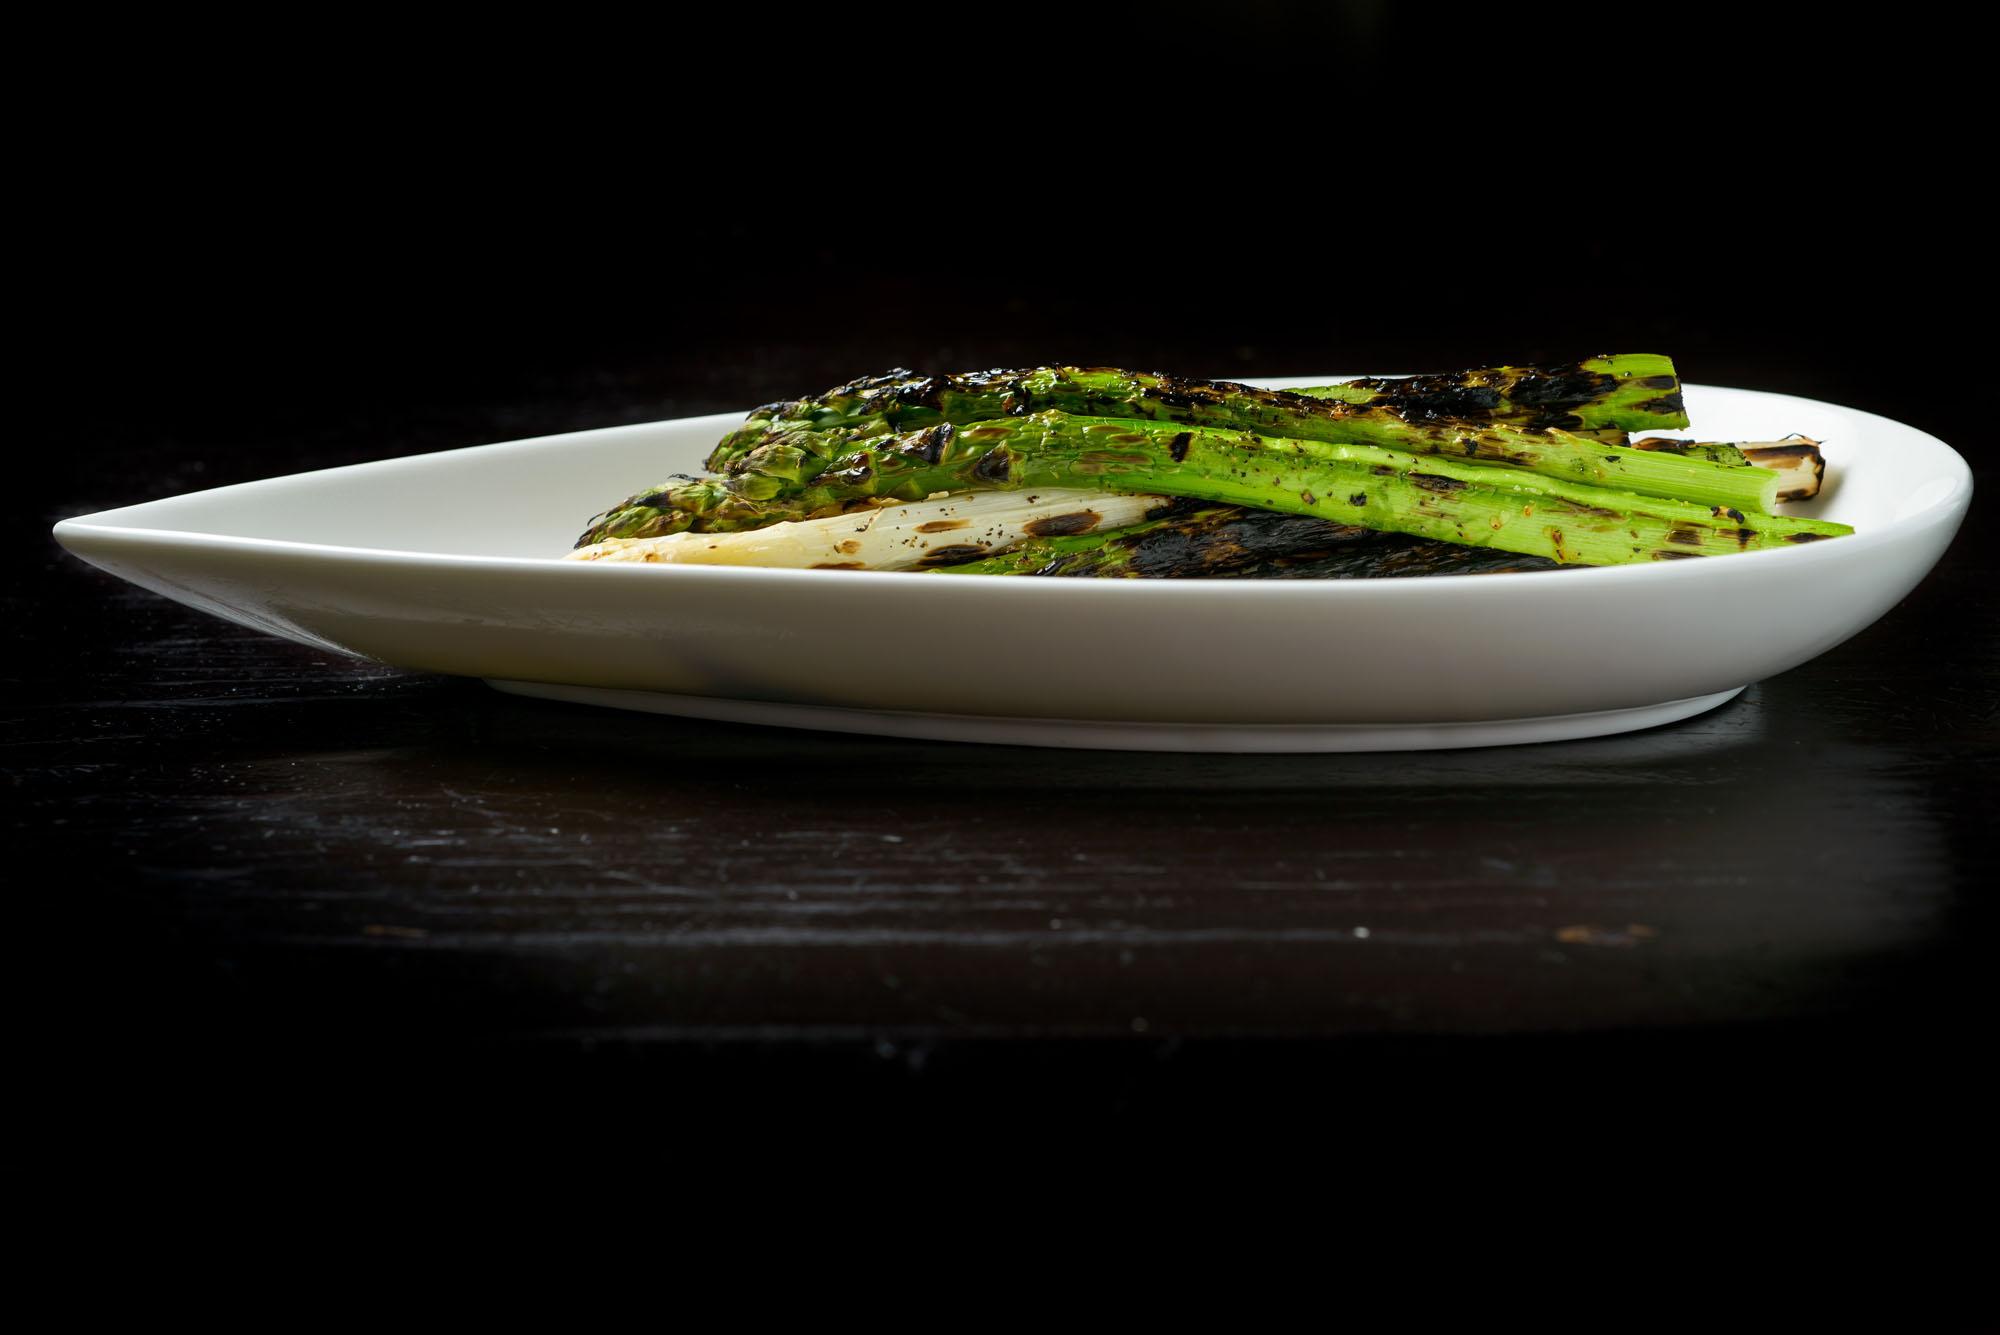 7338_d800_Westin_Maso_New_Menu_John_Hart_San_Francisco_Food_Photography.jpg